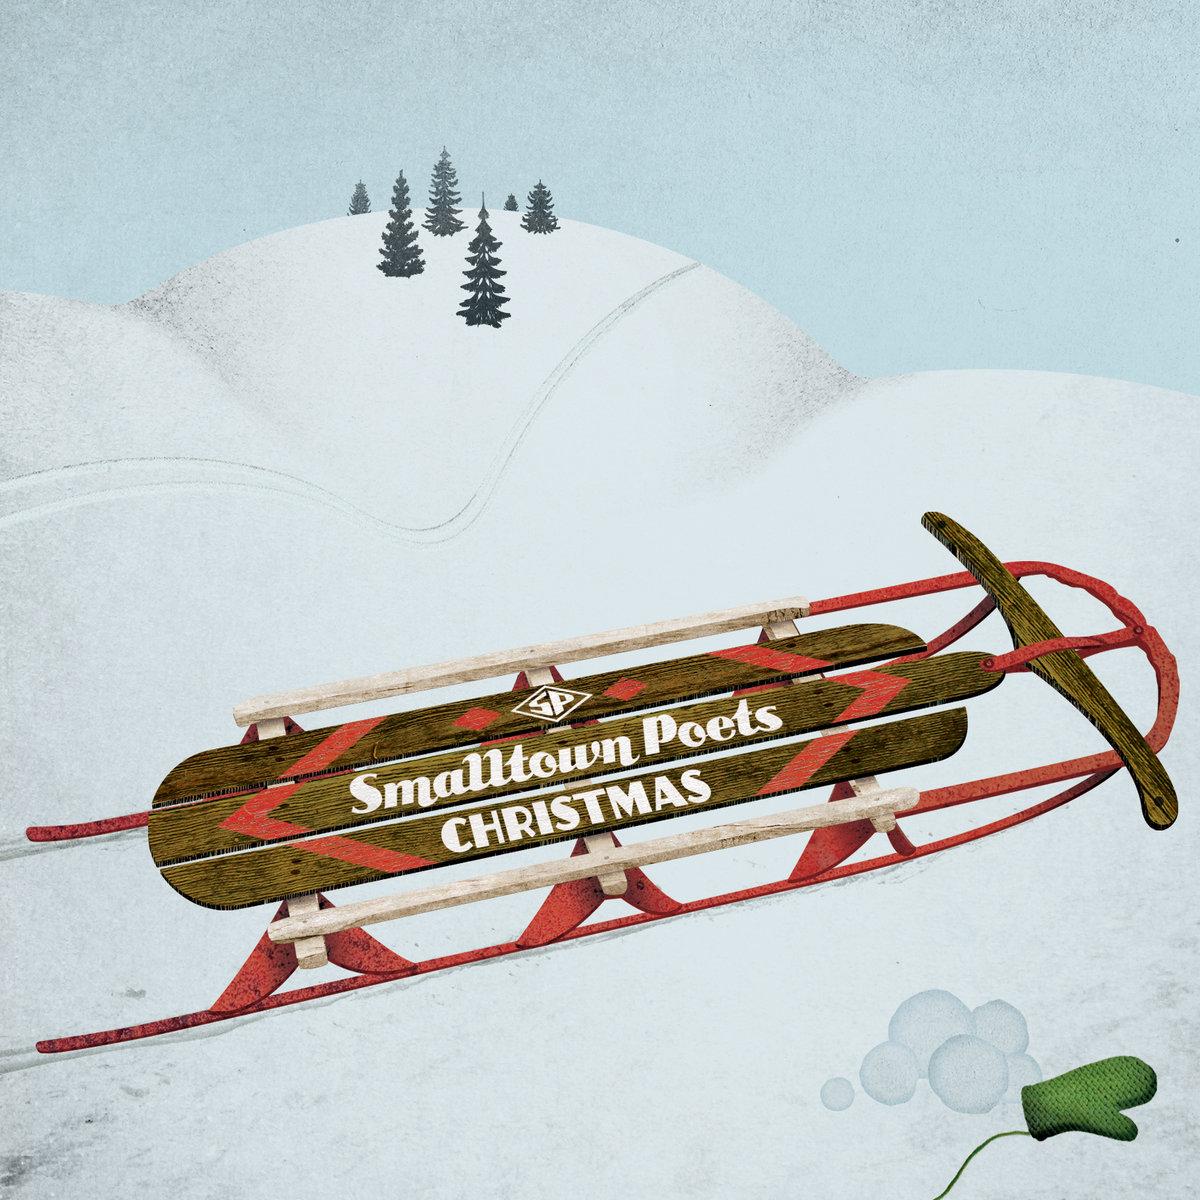 Smalltown Poets Christmas | Smalltown Poets